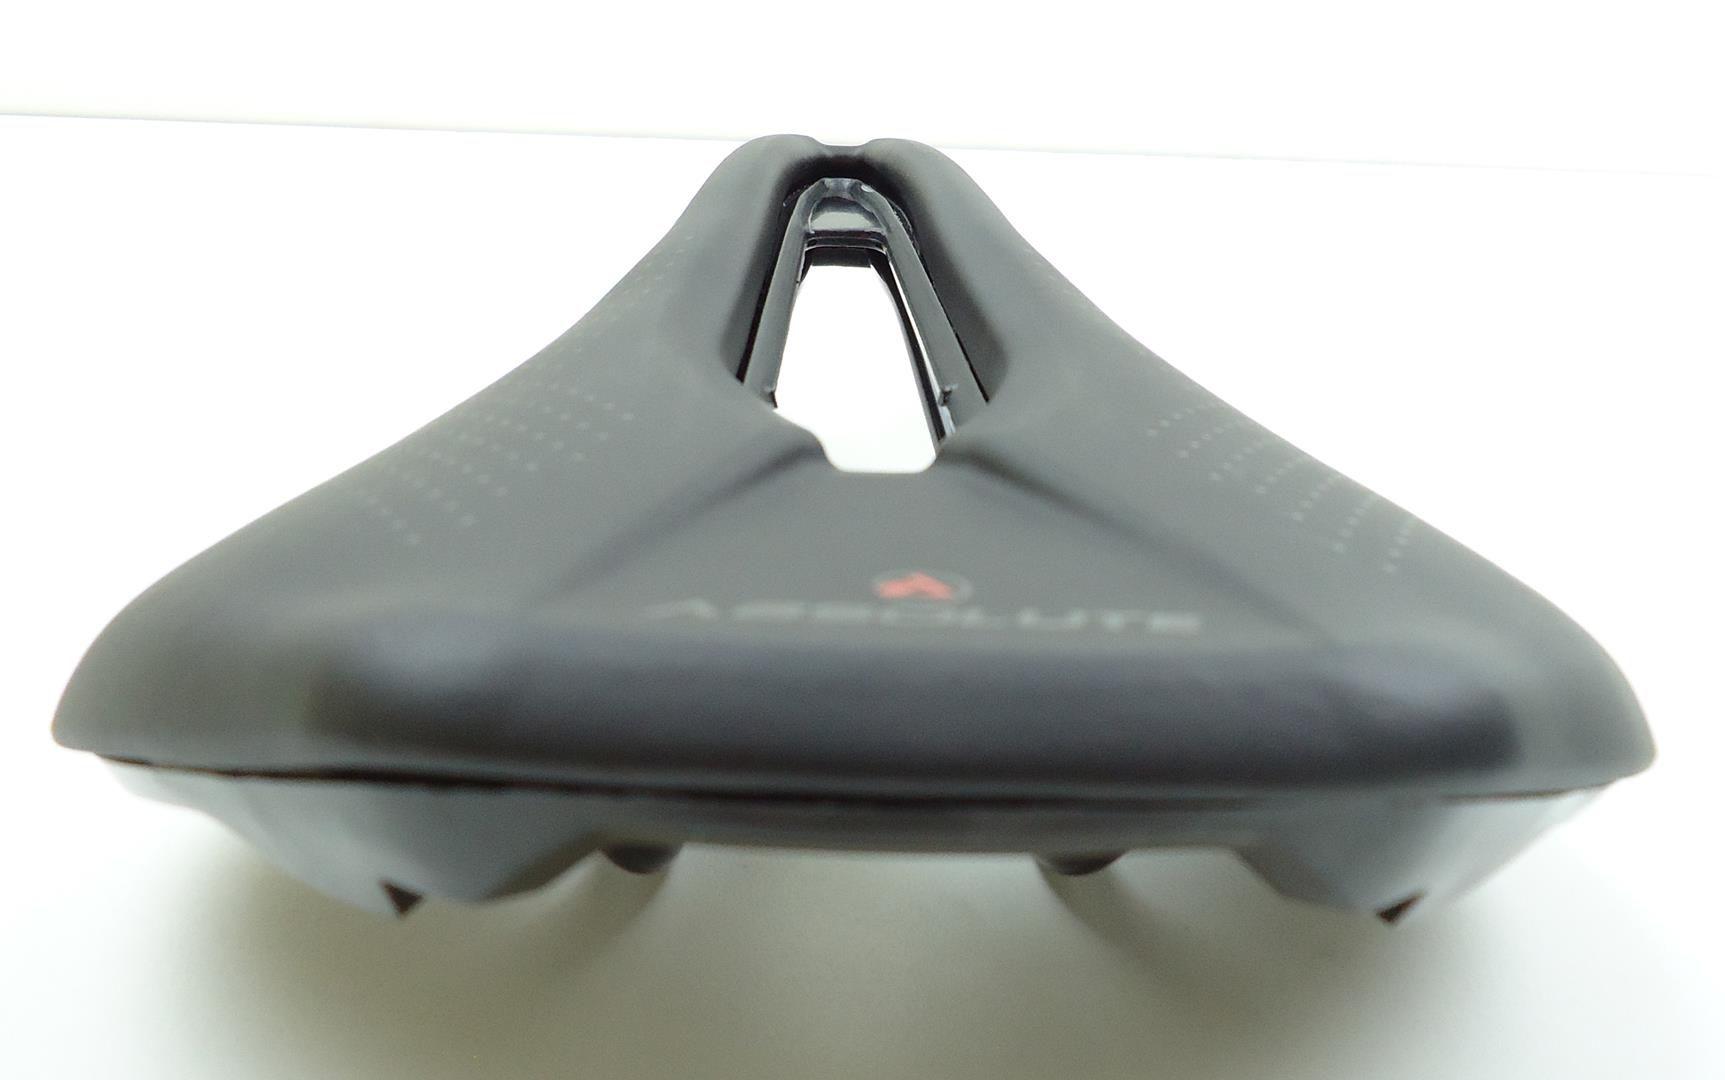 Selim Bicicleta Absolute Prime Estilo Power Cor Preto para Speed ou Mtb 160mm